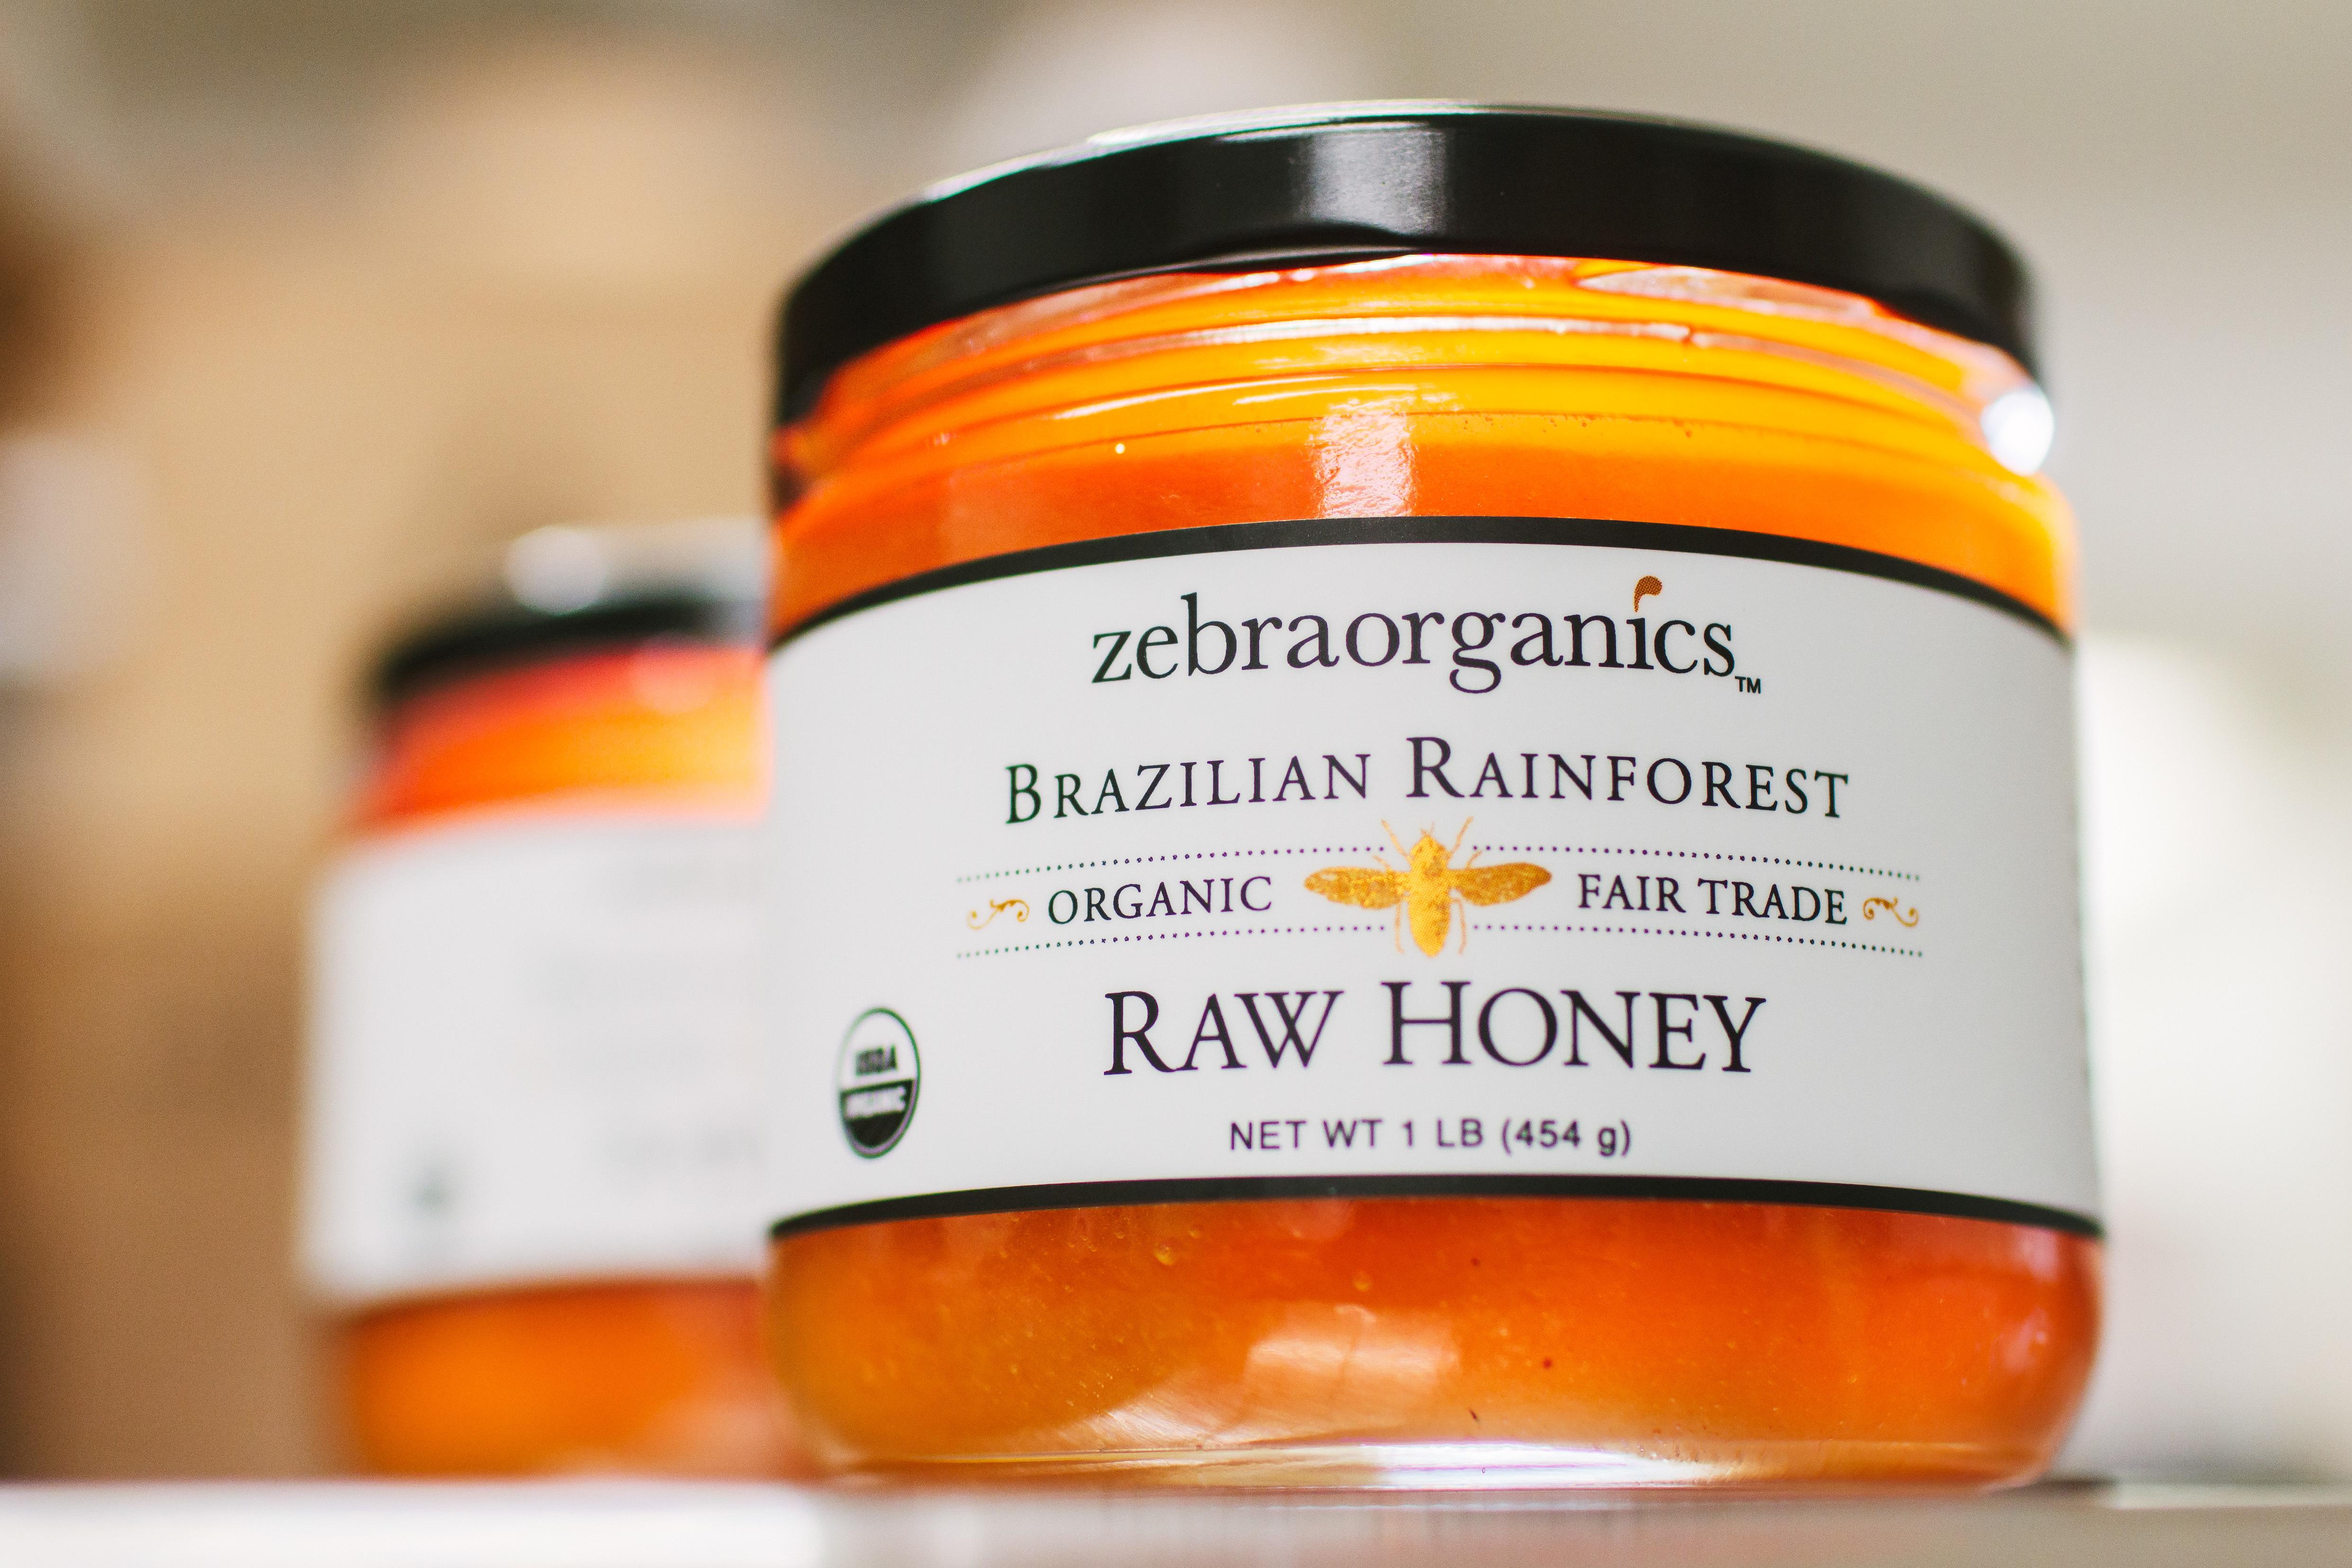 Organic Raw Brazilian Rainforest Honey